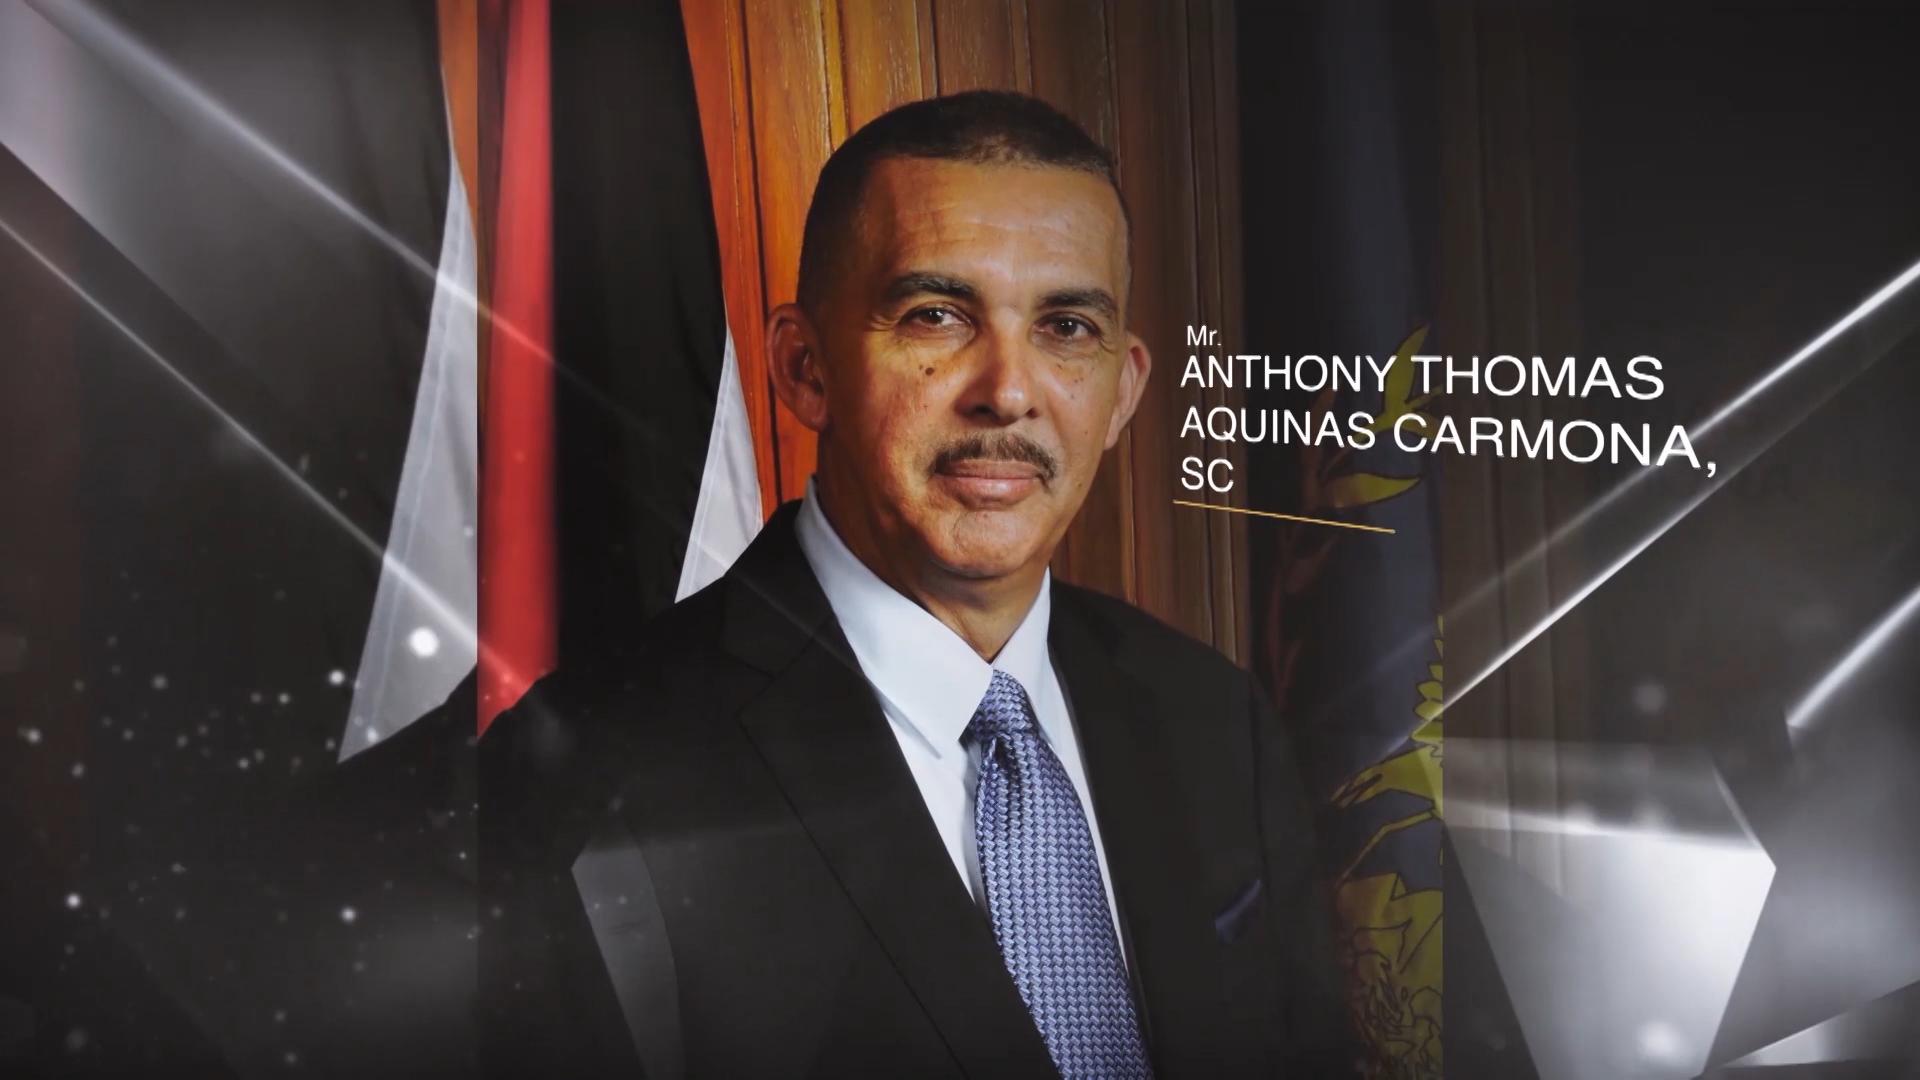 PRESIDENTS OF THE PAST – Mr. Anthony Thomas Aquinas Carmona, S